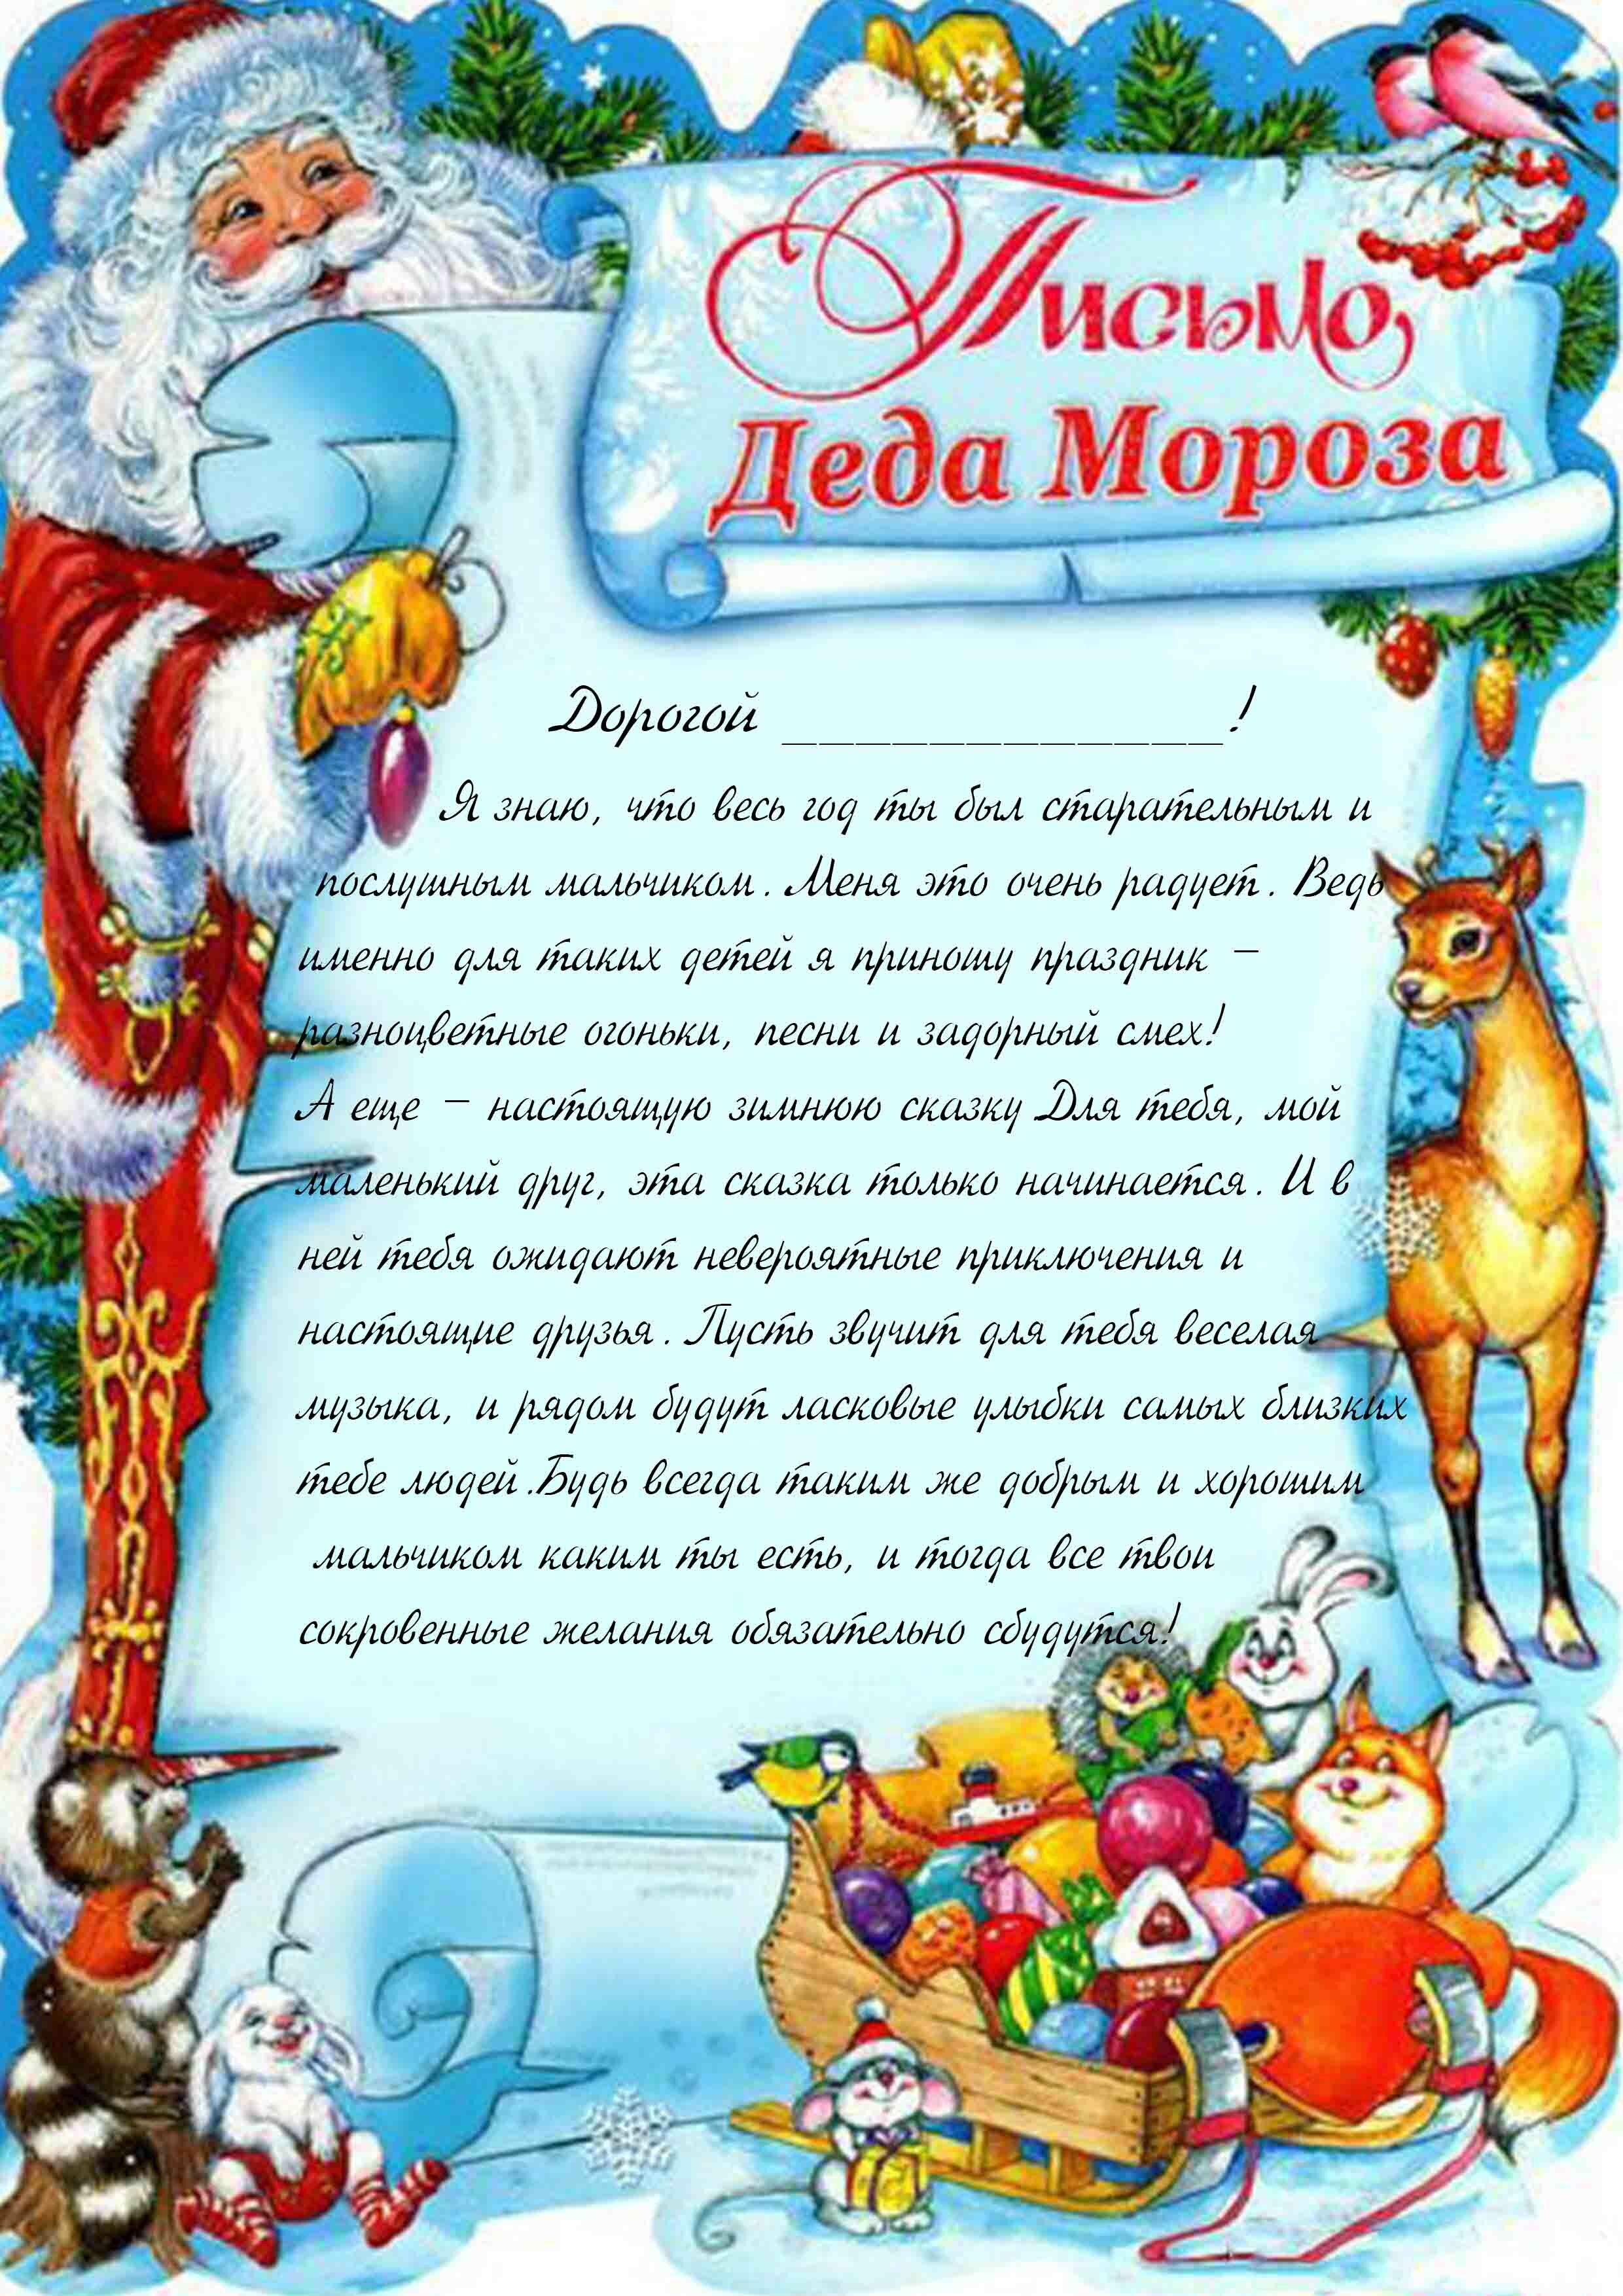 pismo-ot-deda-moroza-2017-shablon-skachat-besplatno-malchikam-3